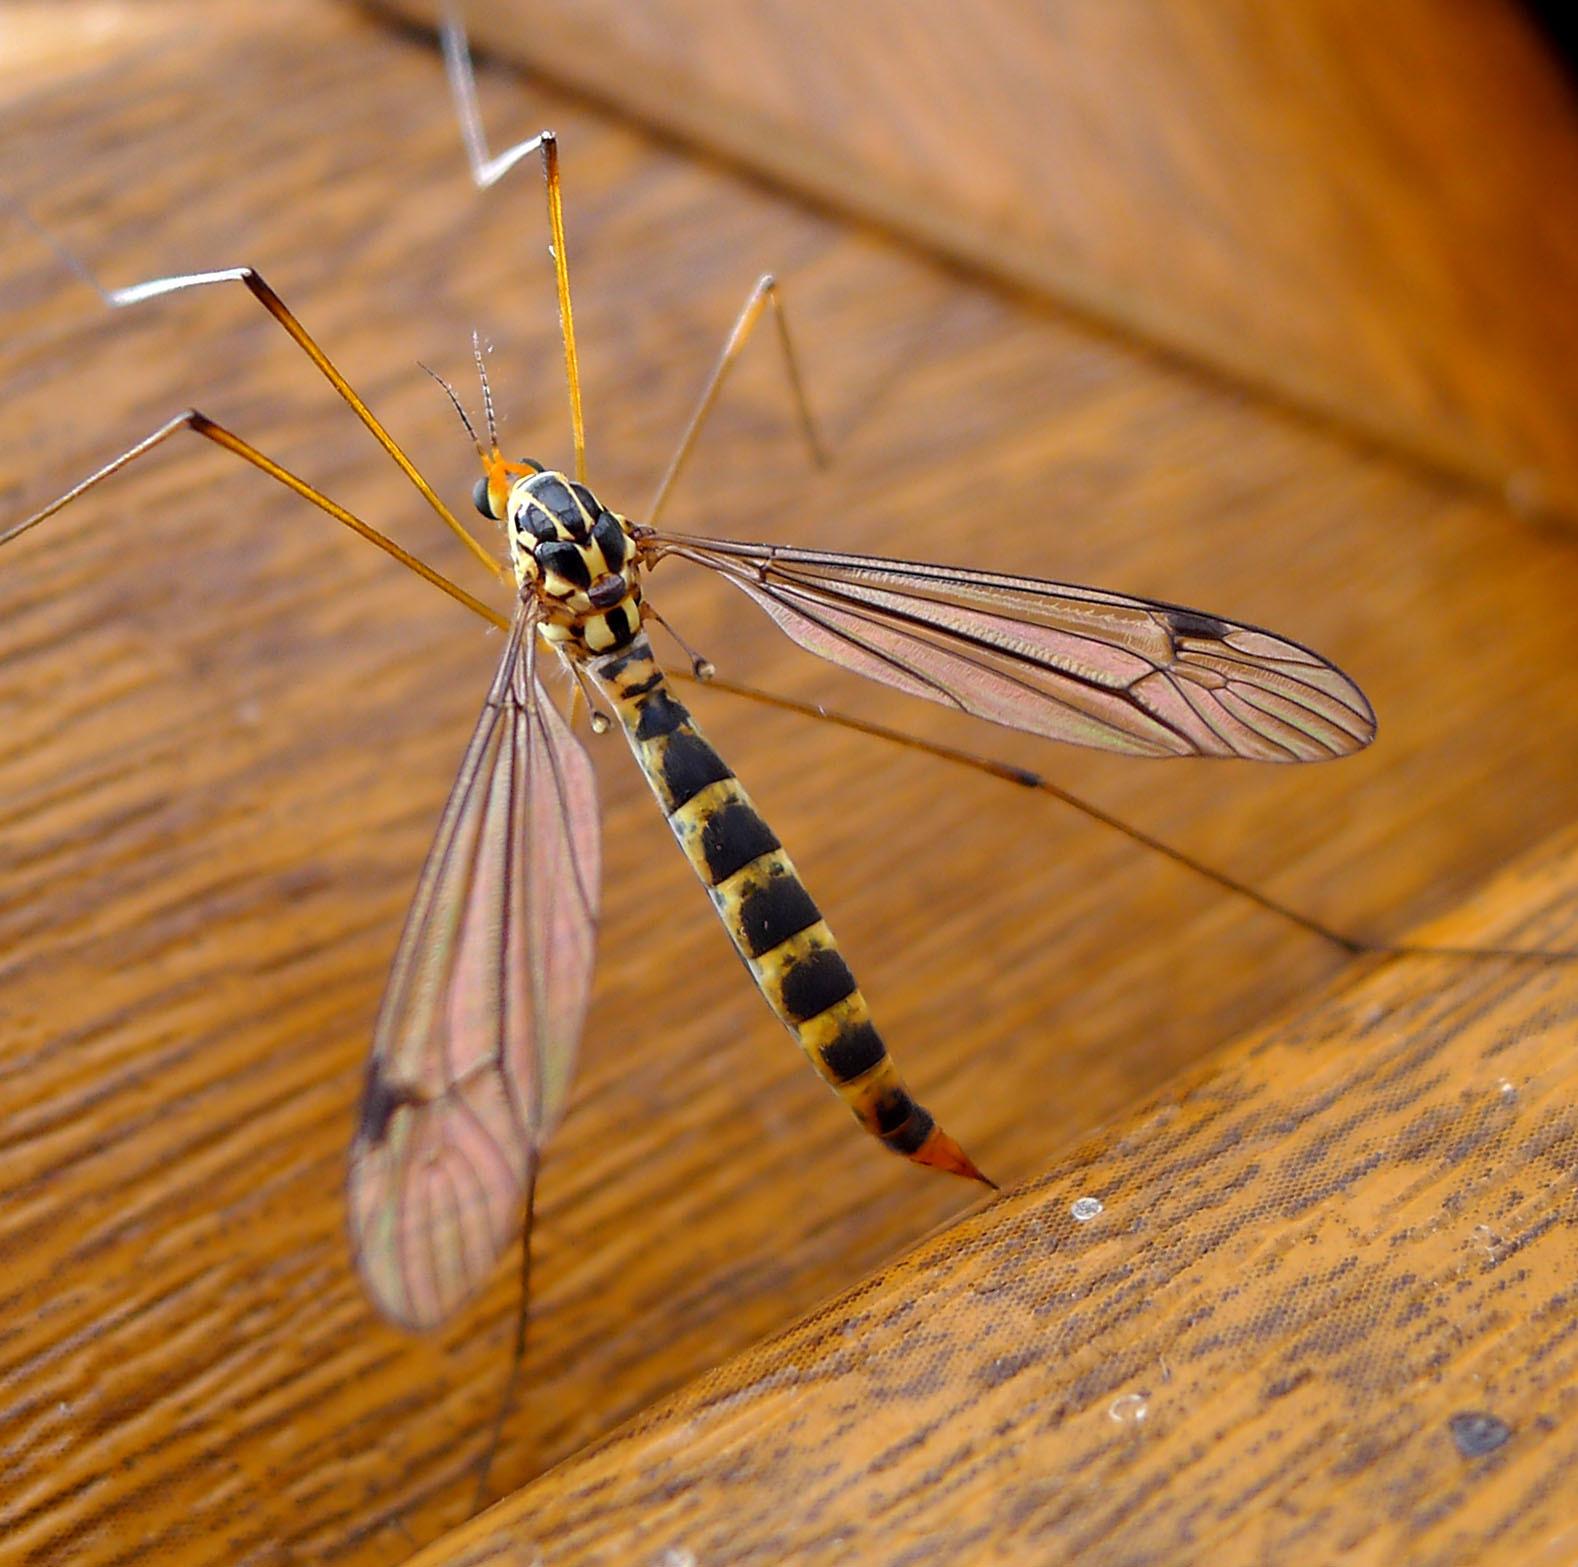 Image of Tiger Crane Flies